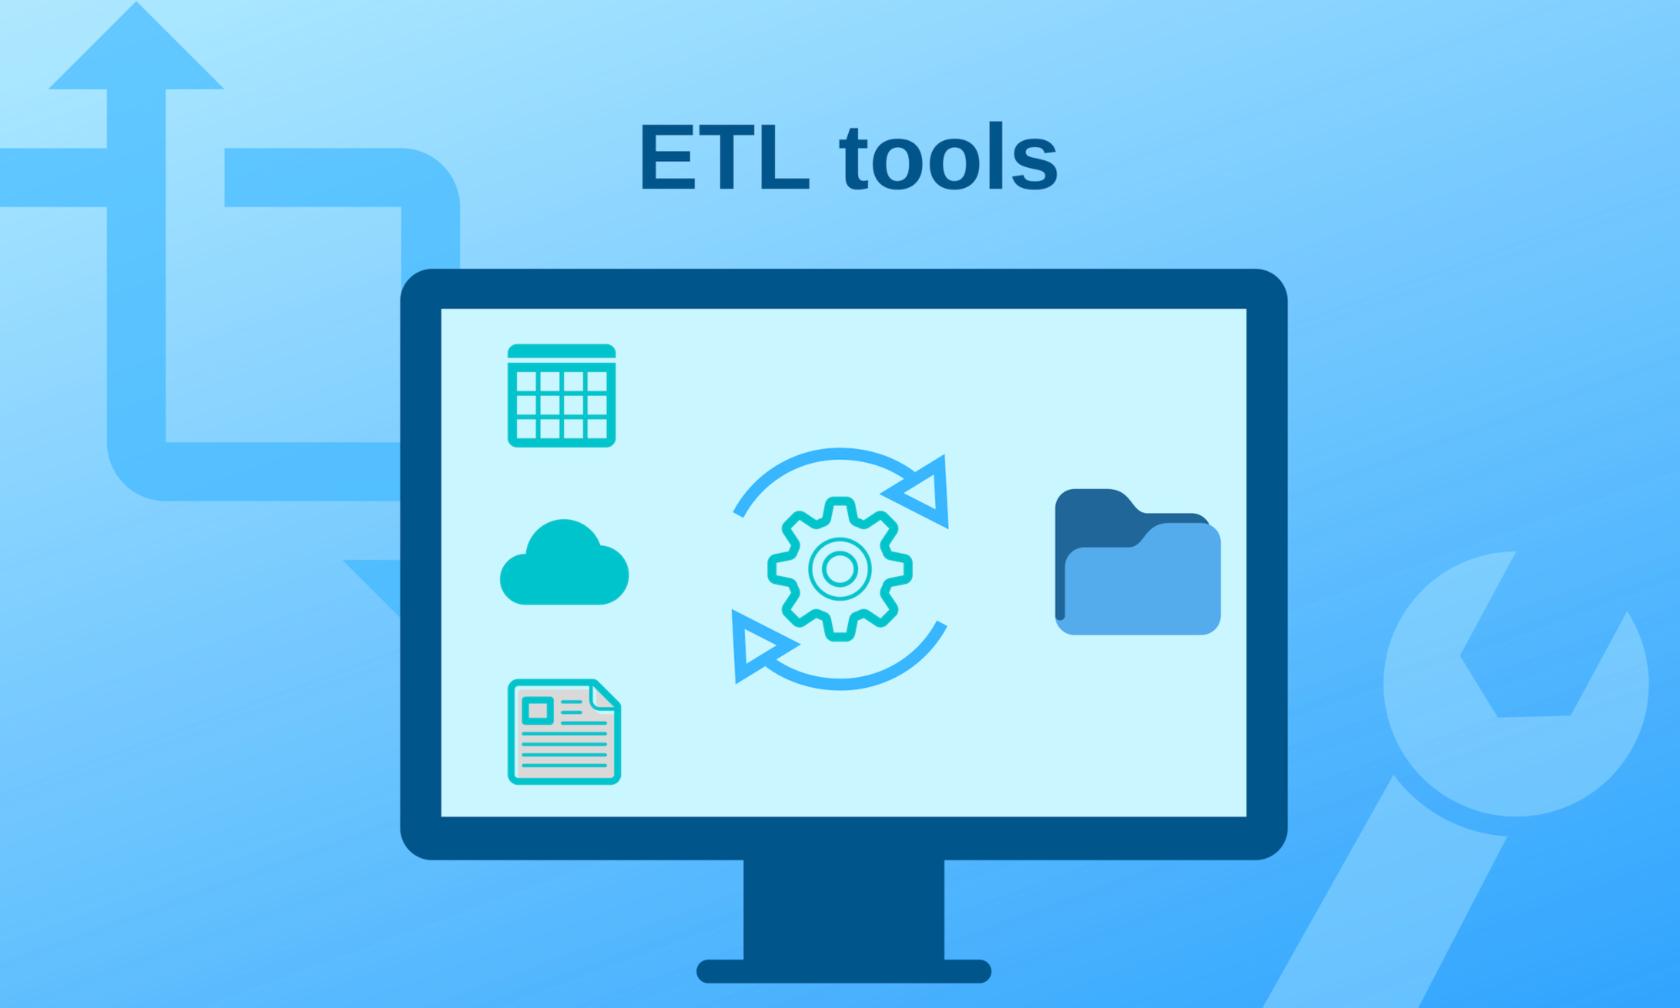 Top 5 ETL Tools for Enterprise